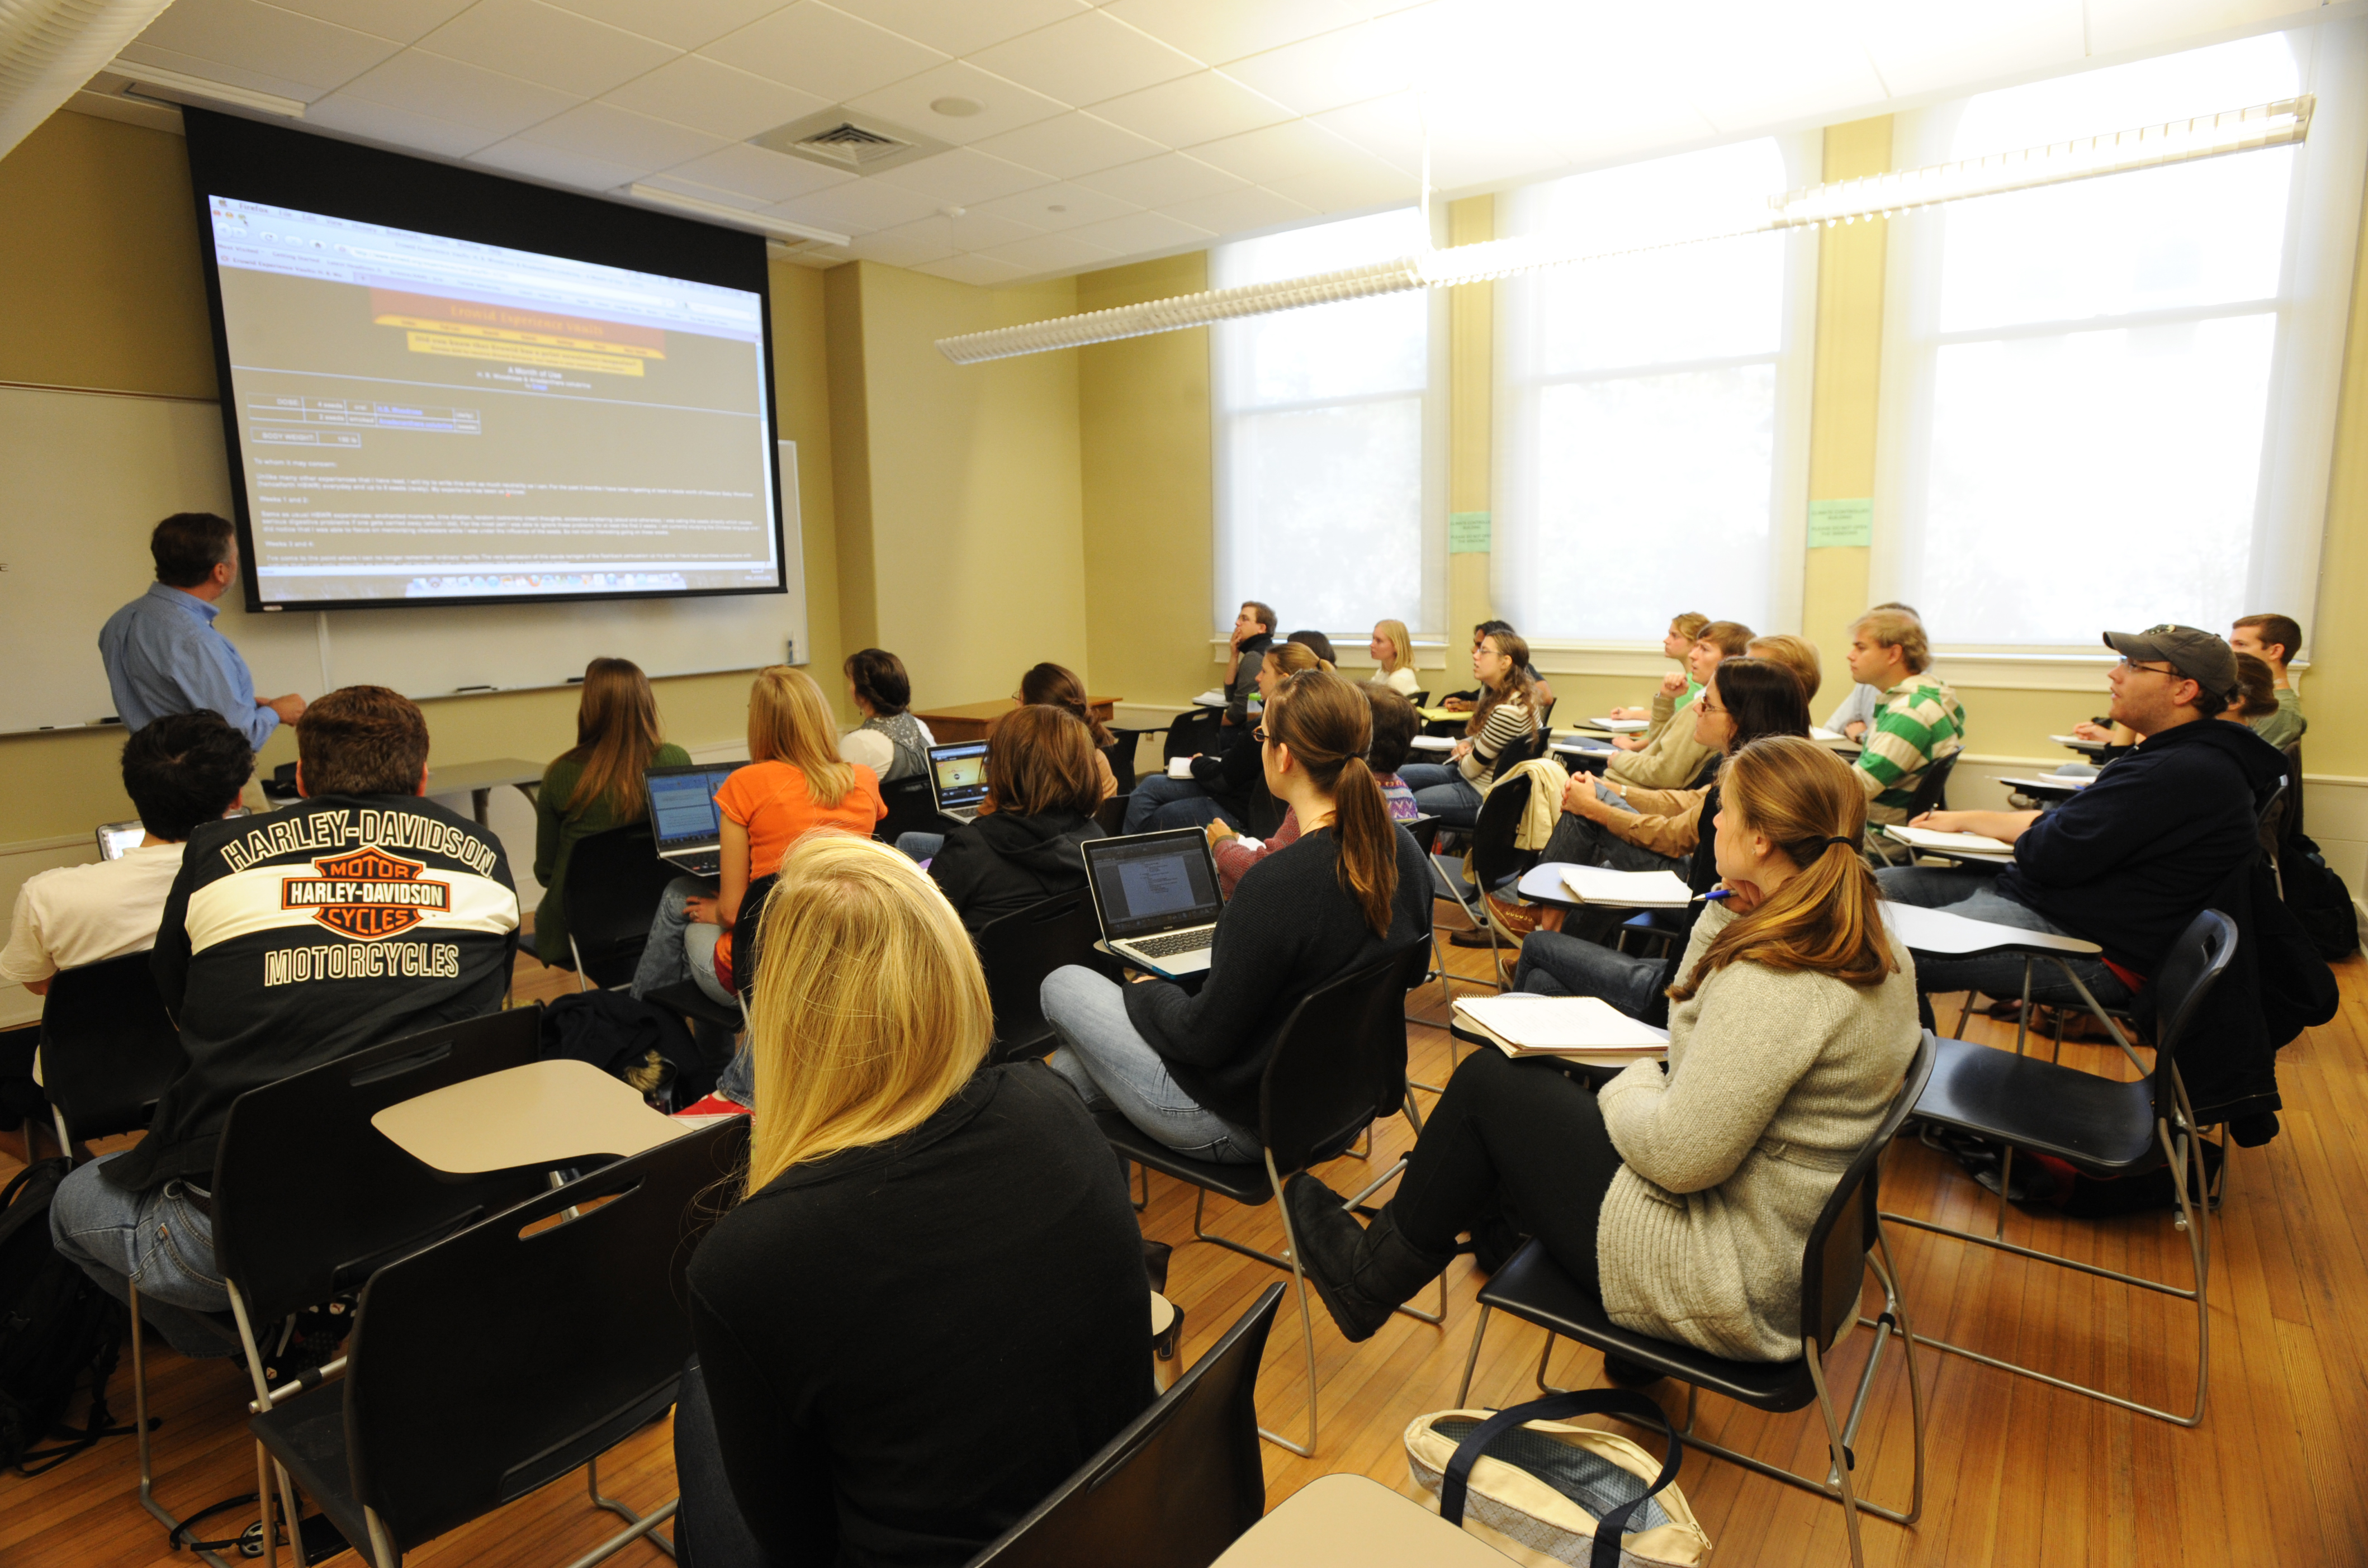 classroom - photo #36